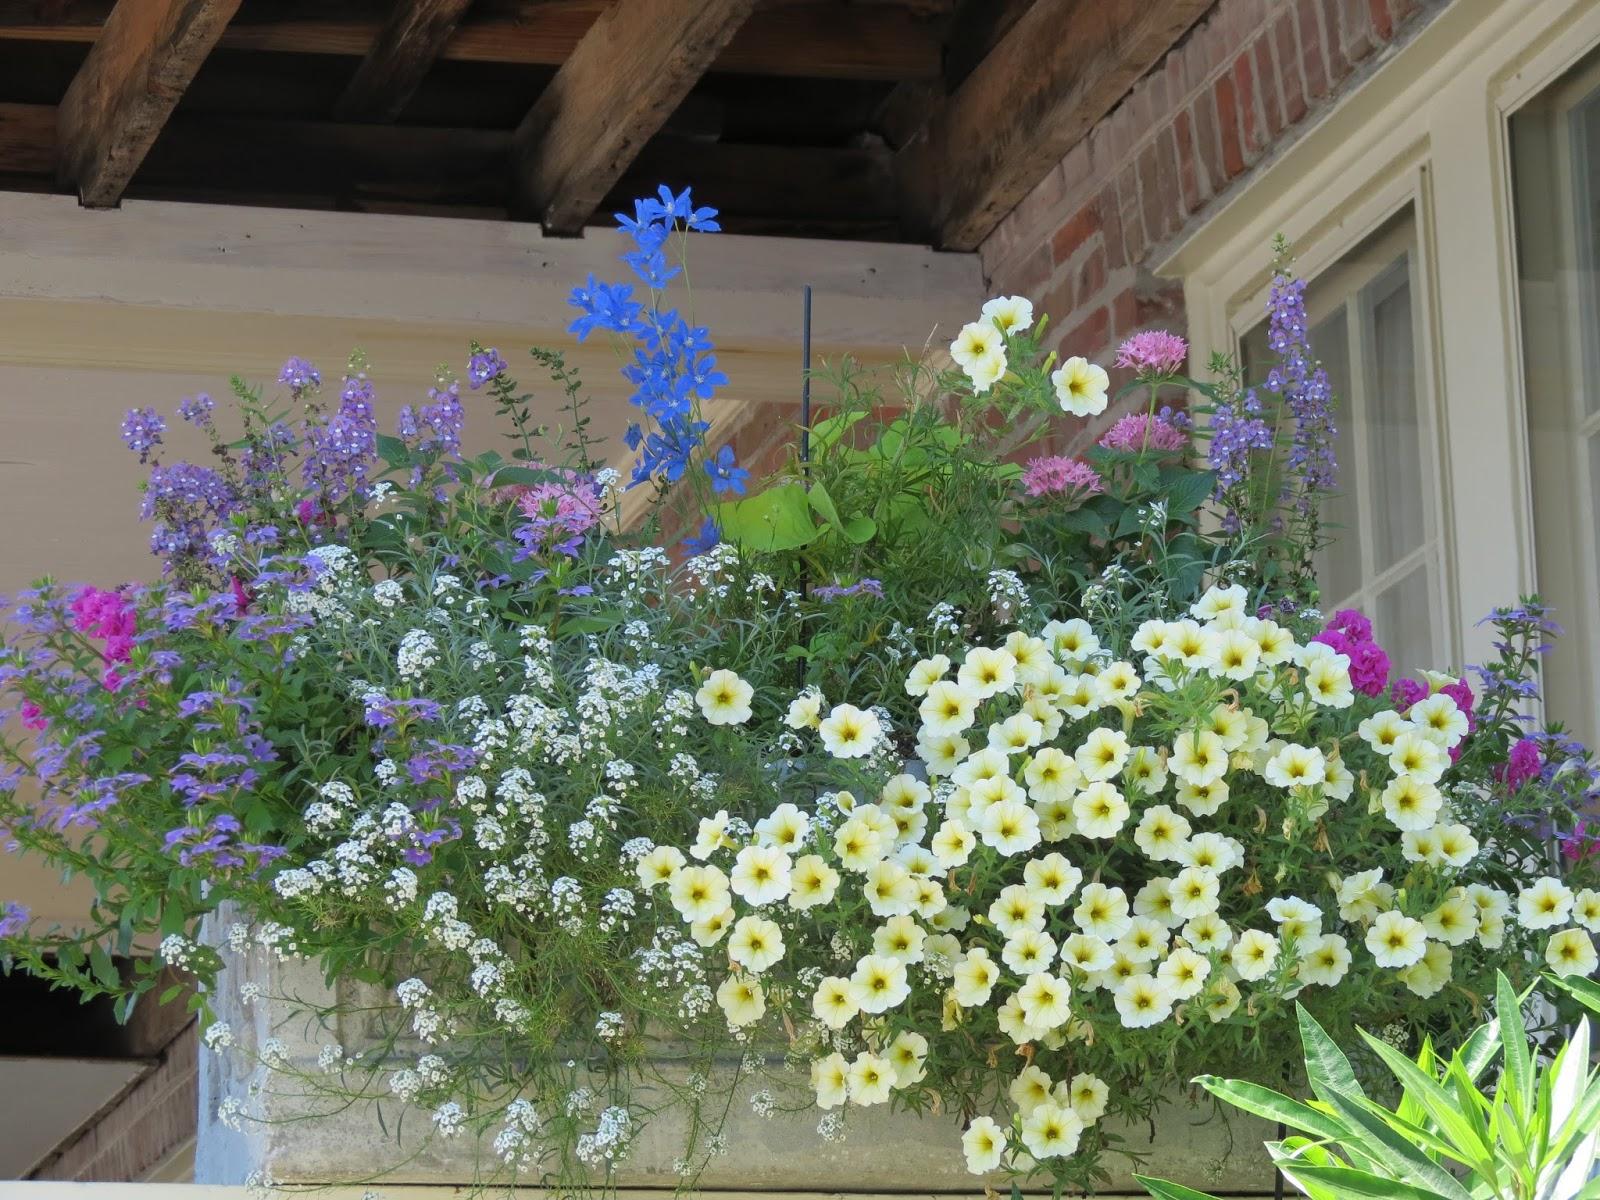 JLL DESIGN: Window Box Ideas & More Garden Inspirations